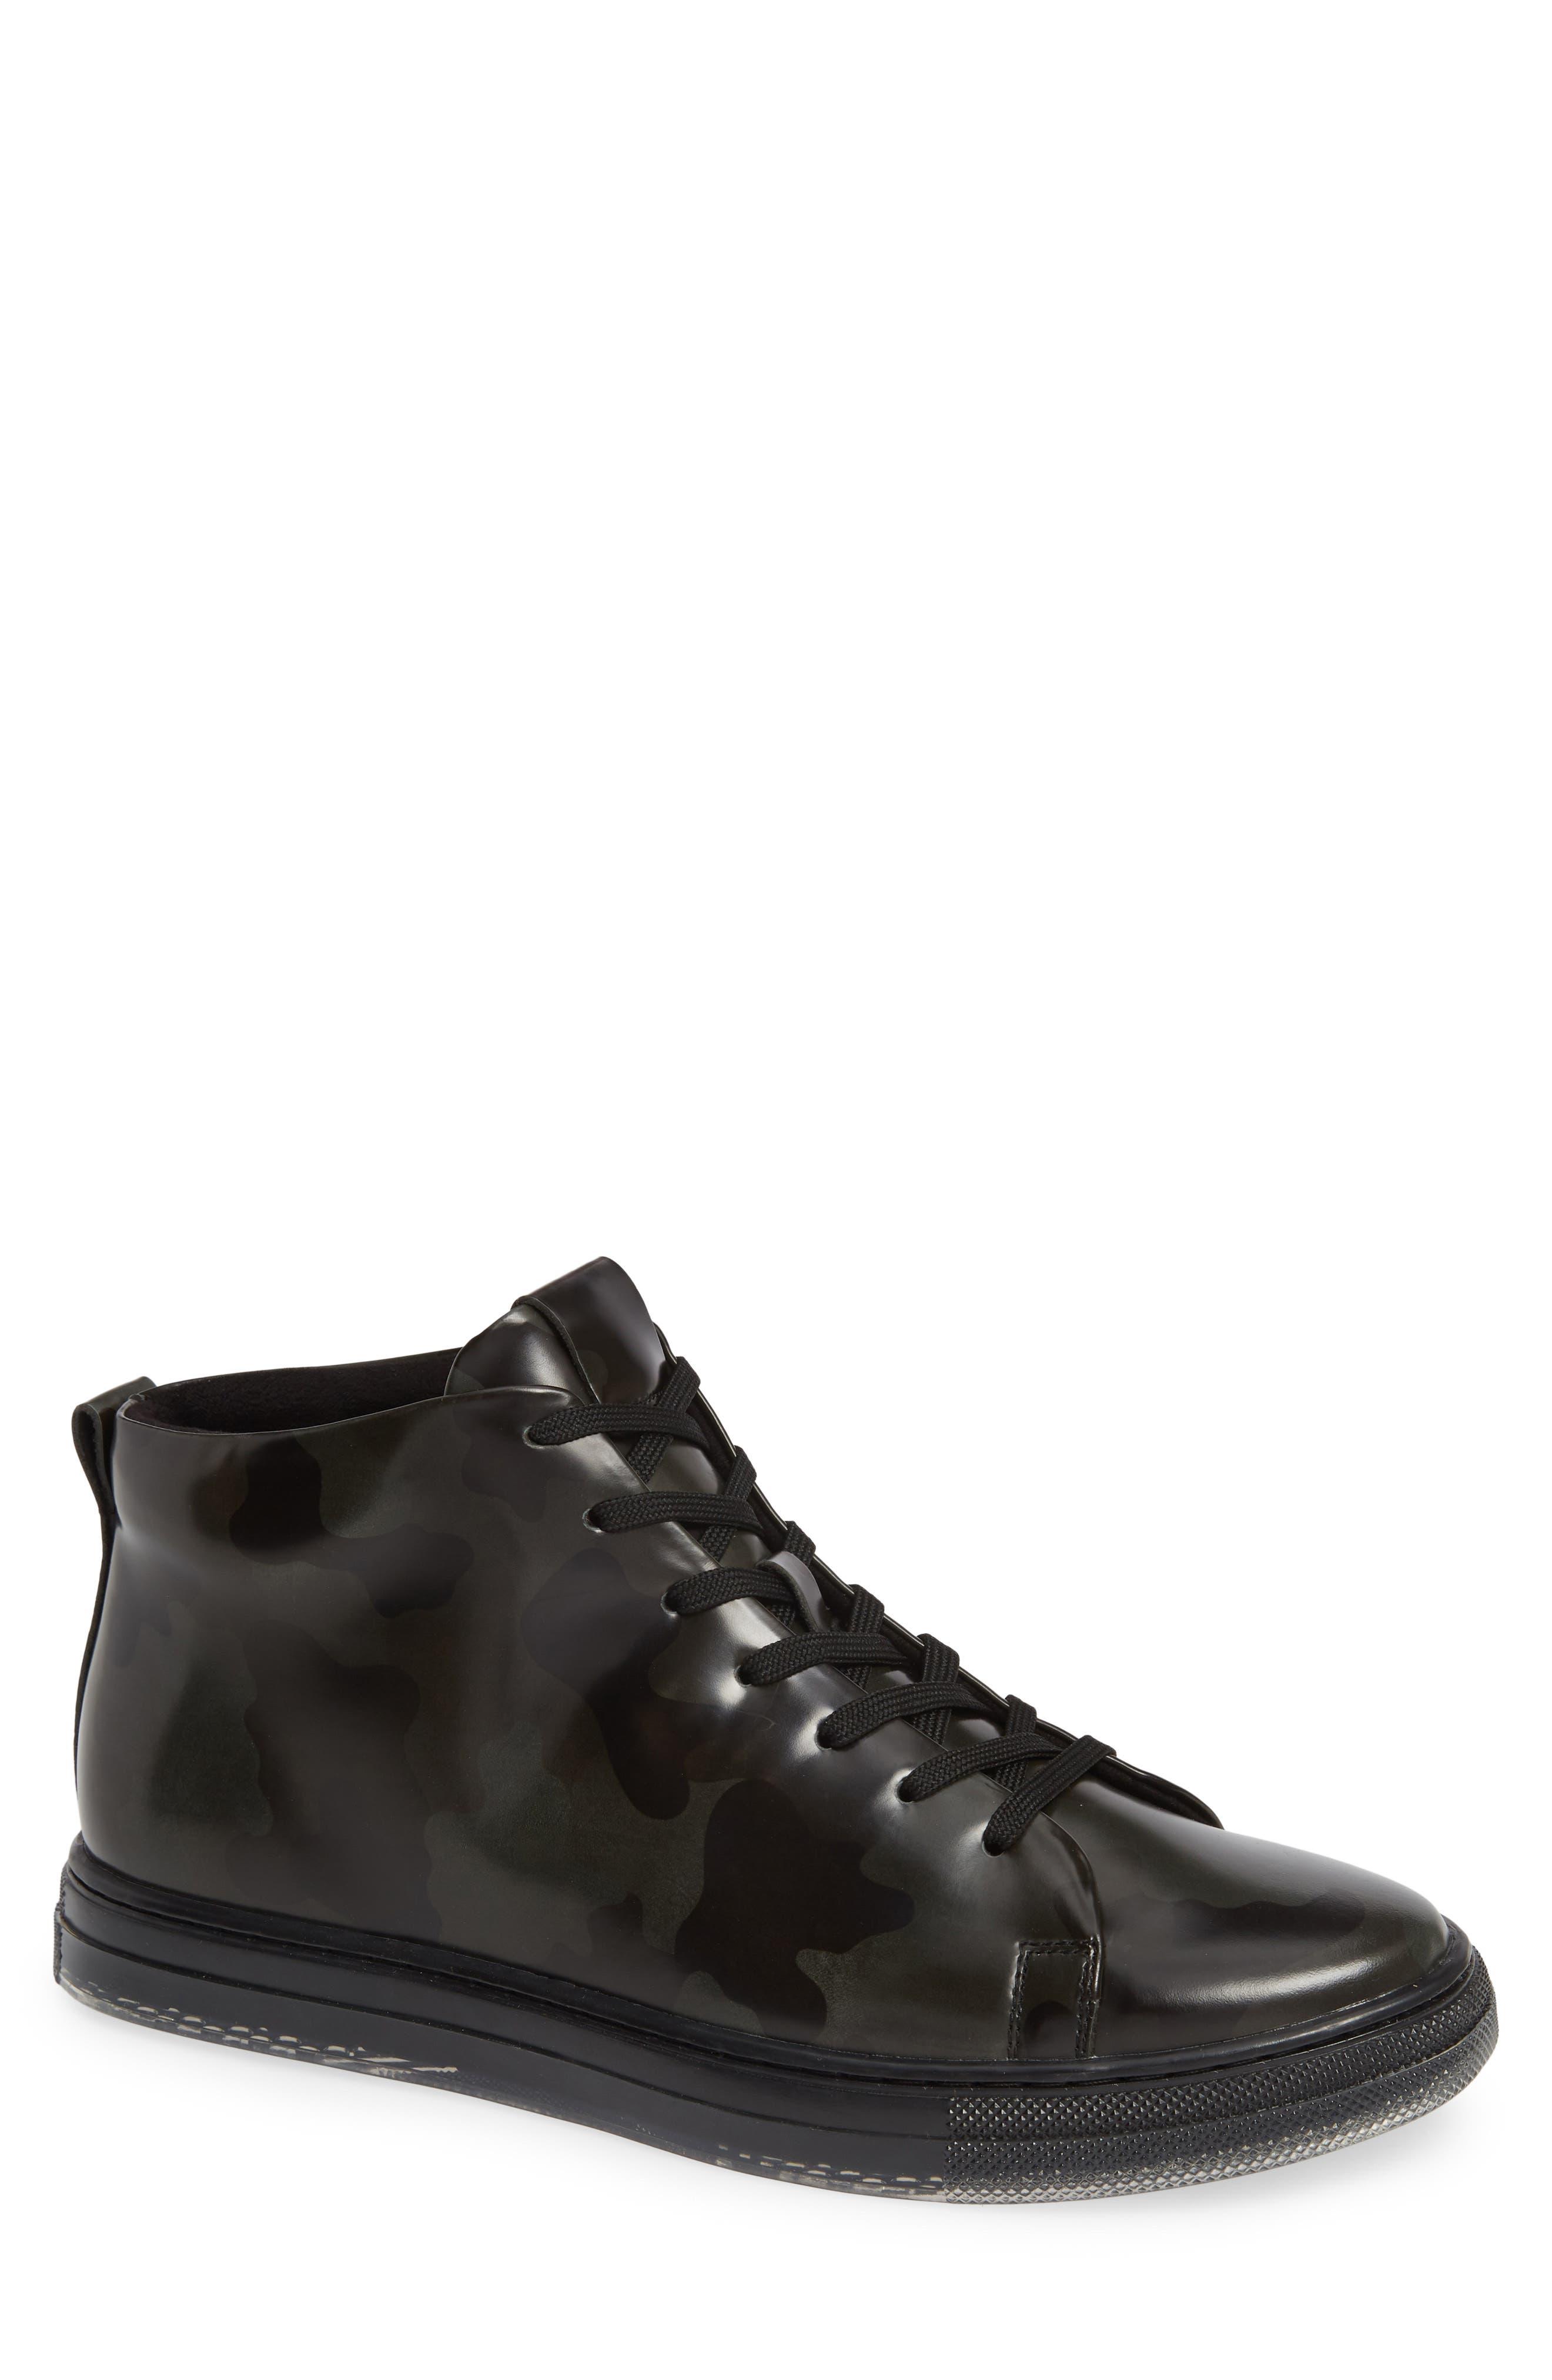 Kenneth Cole Colvin Camo High Top Sneaker- Green